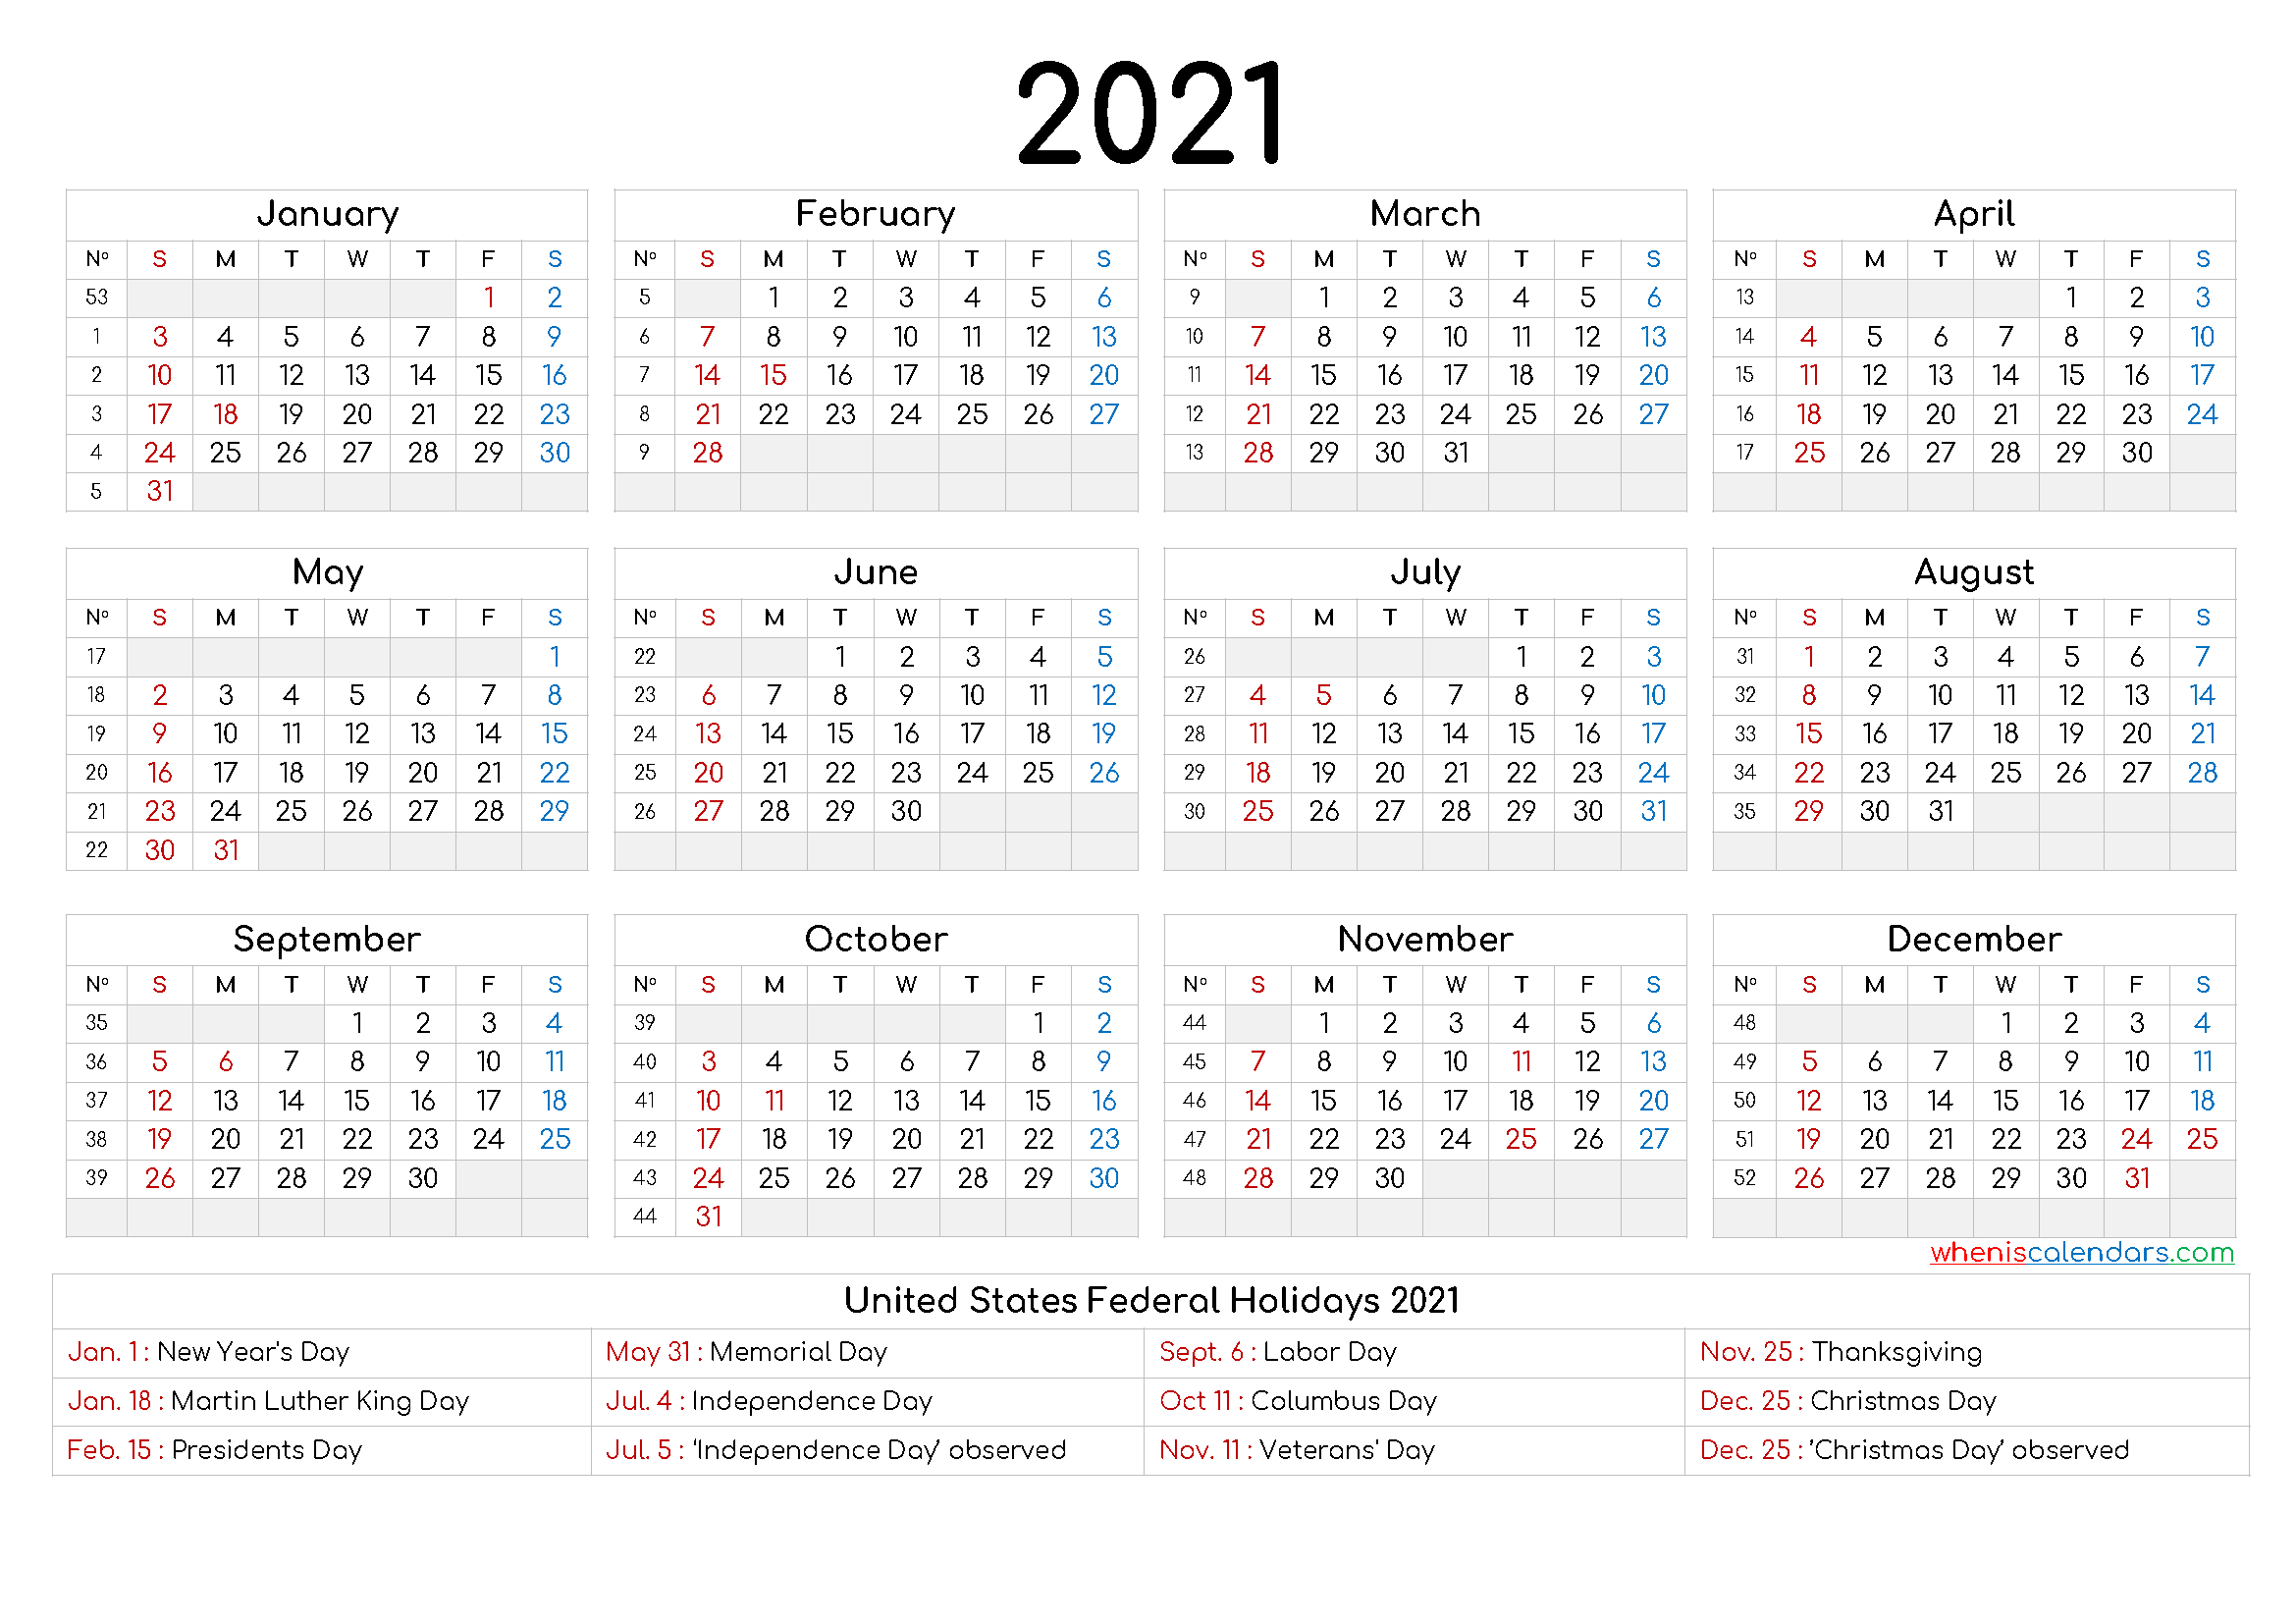 Free Printable 2021 Calendar With Holidays - 6 Templates-4 X 6 Calendars 2021